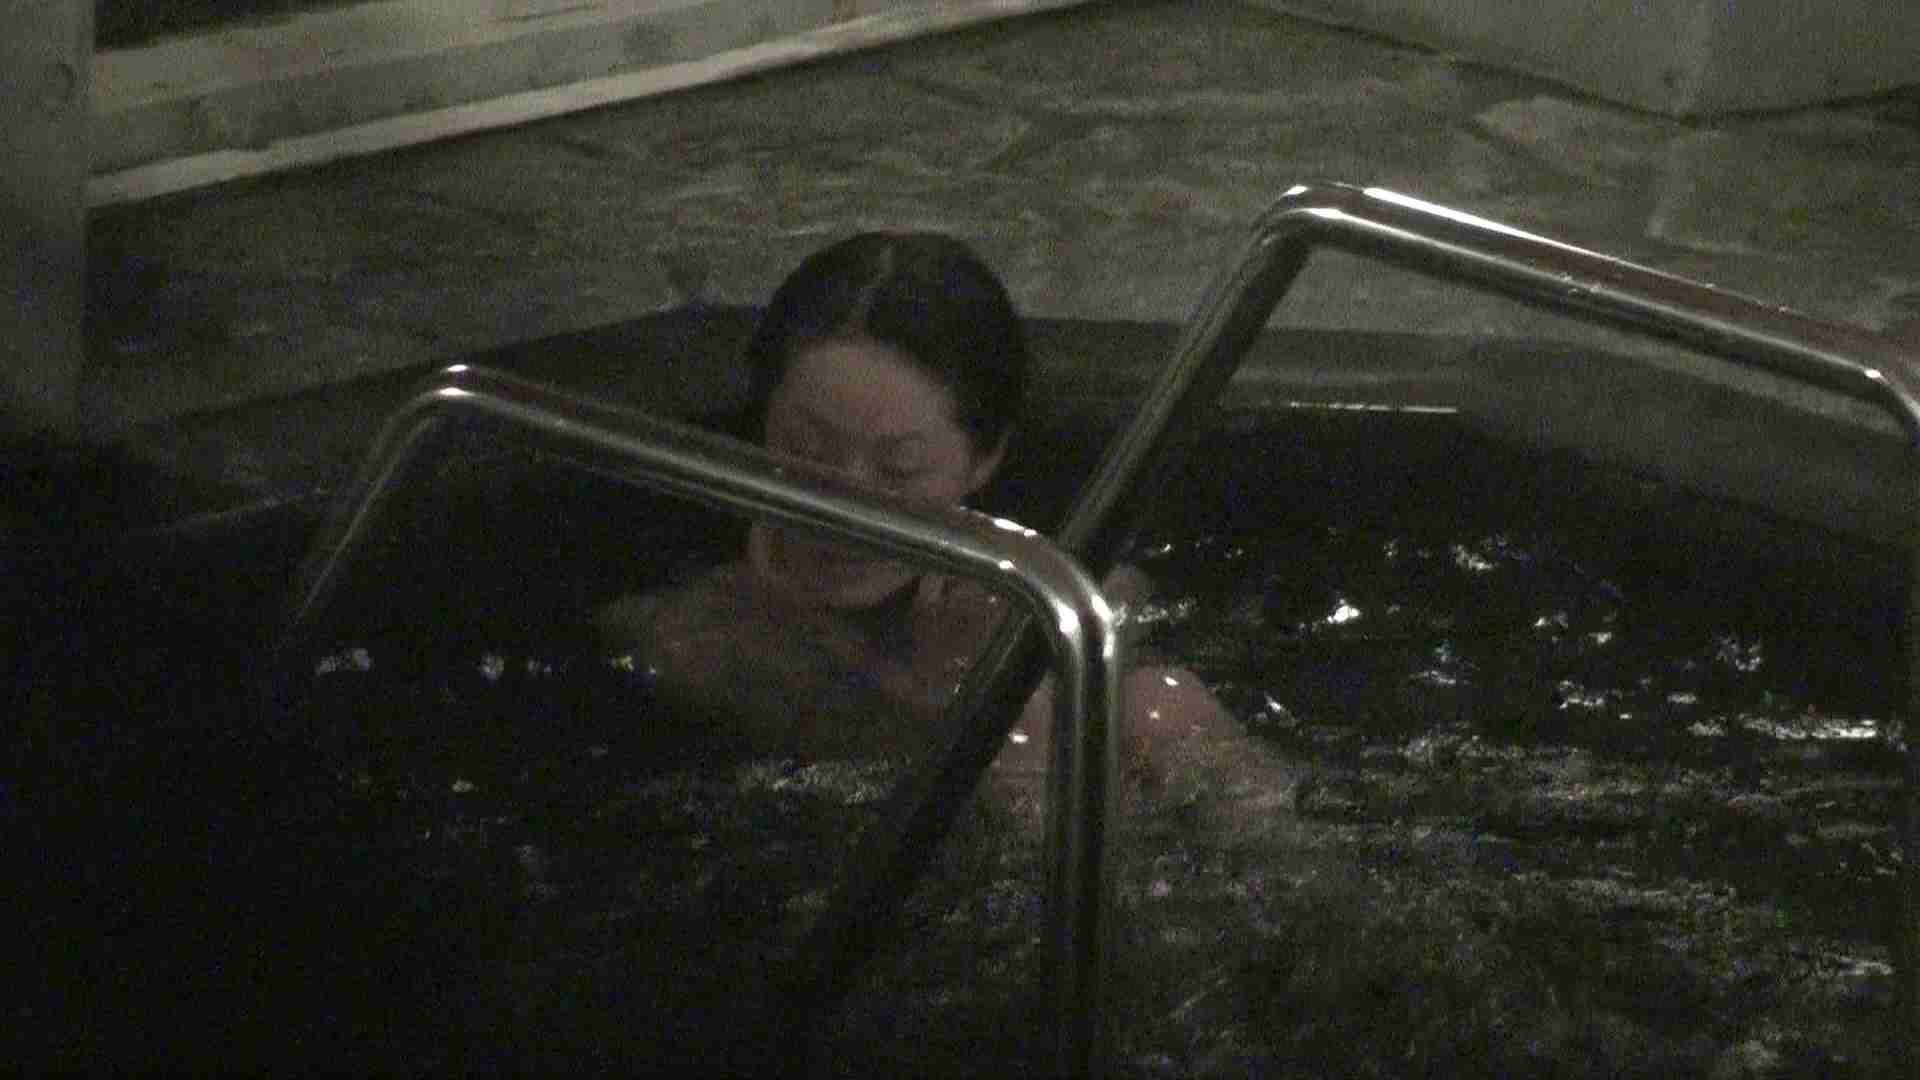 Aquaな露天風呂Vol.318 OLセックス 盗み撮りSEX無修正画像 48画像 38